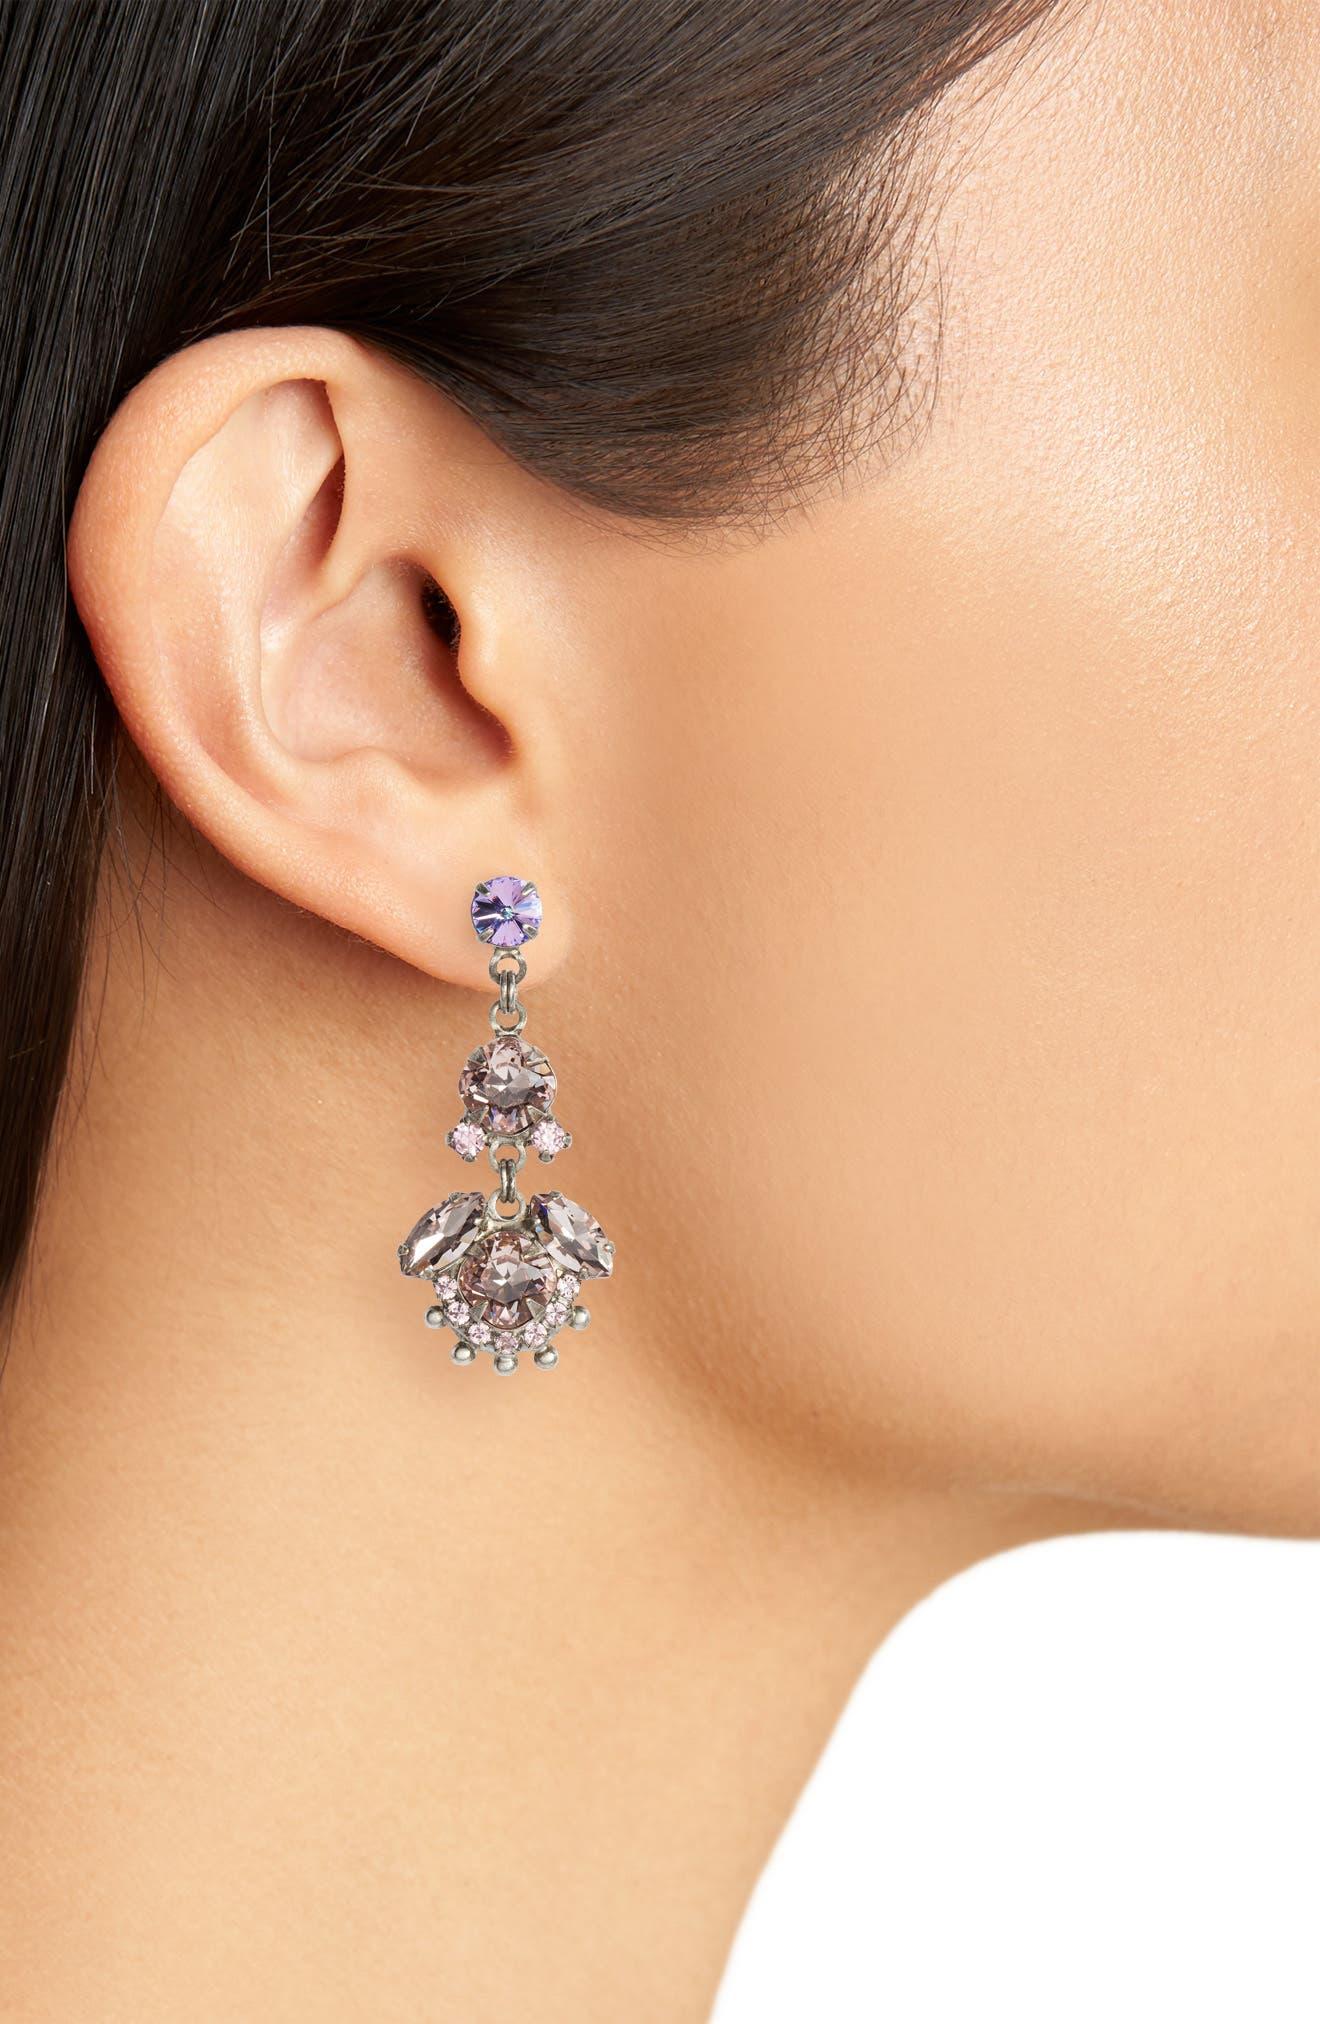 California Poppy Crystal Drop Earrings,                             Alternate thumbnail 2, color,                             PINK